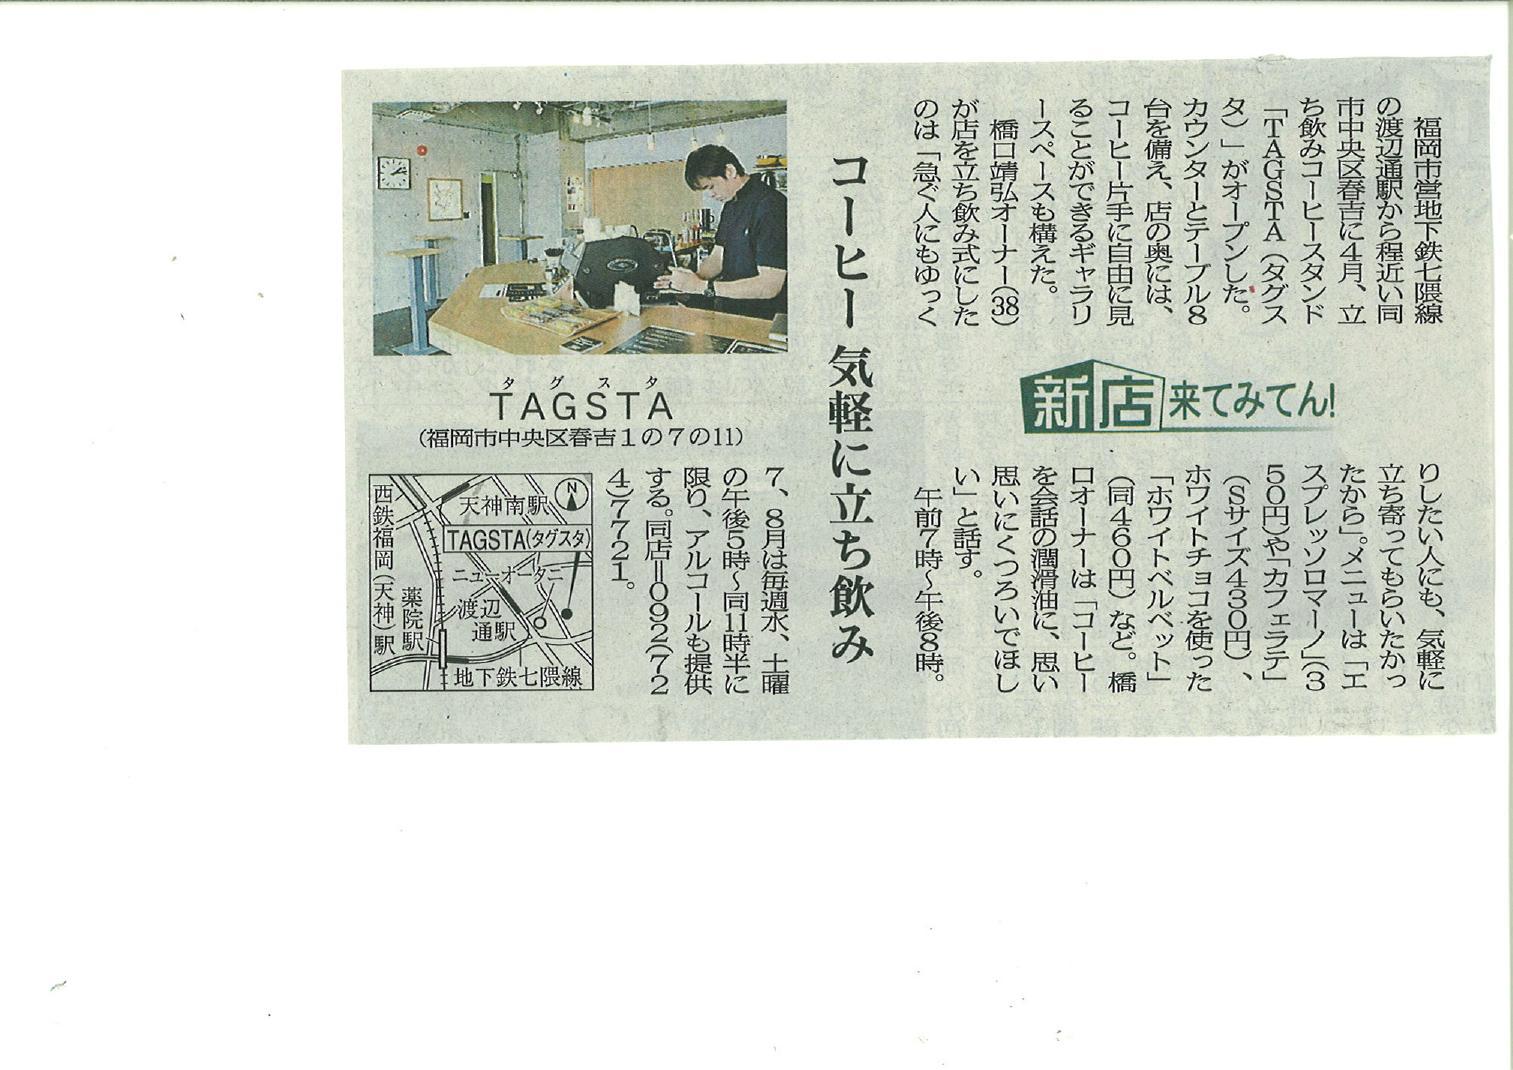 tag sta 新聞記事 120703?0001